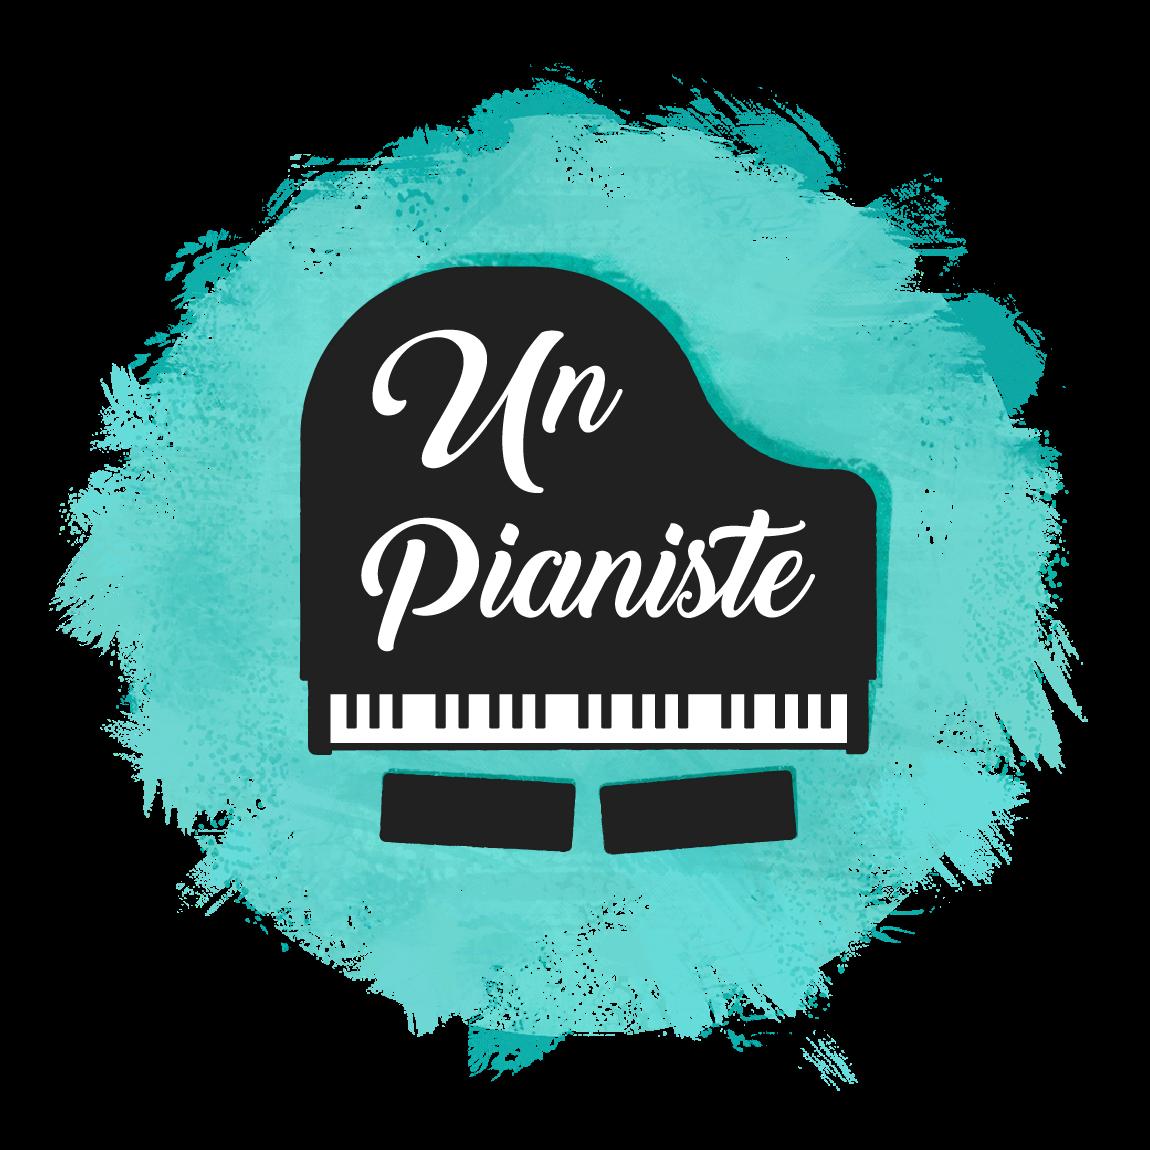 Unpianiste